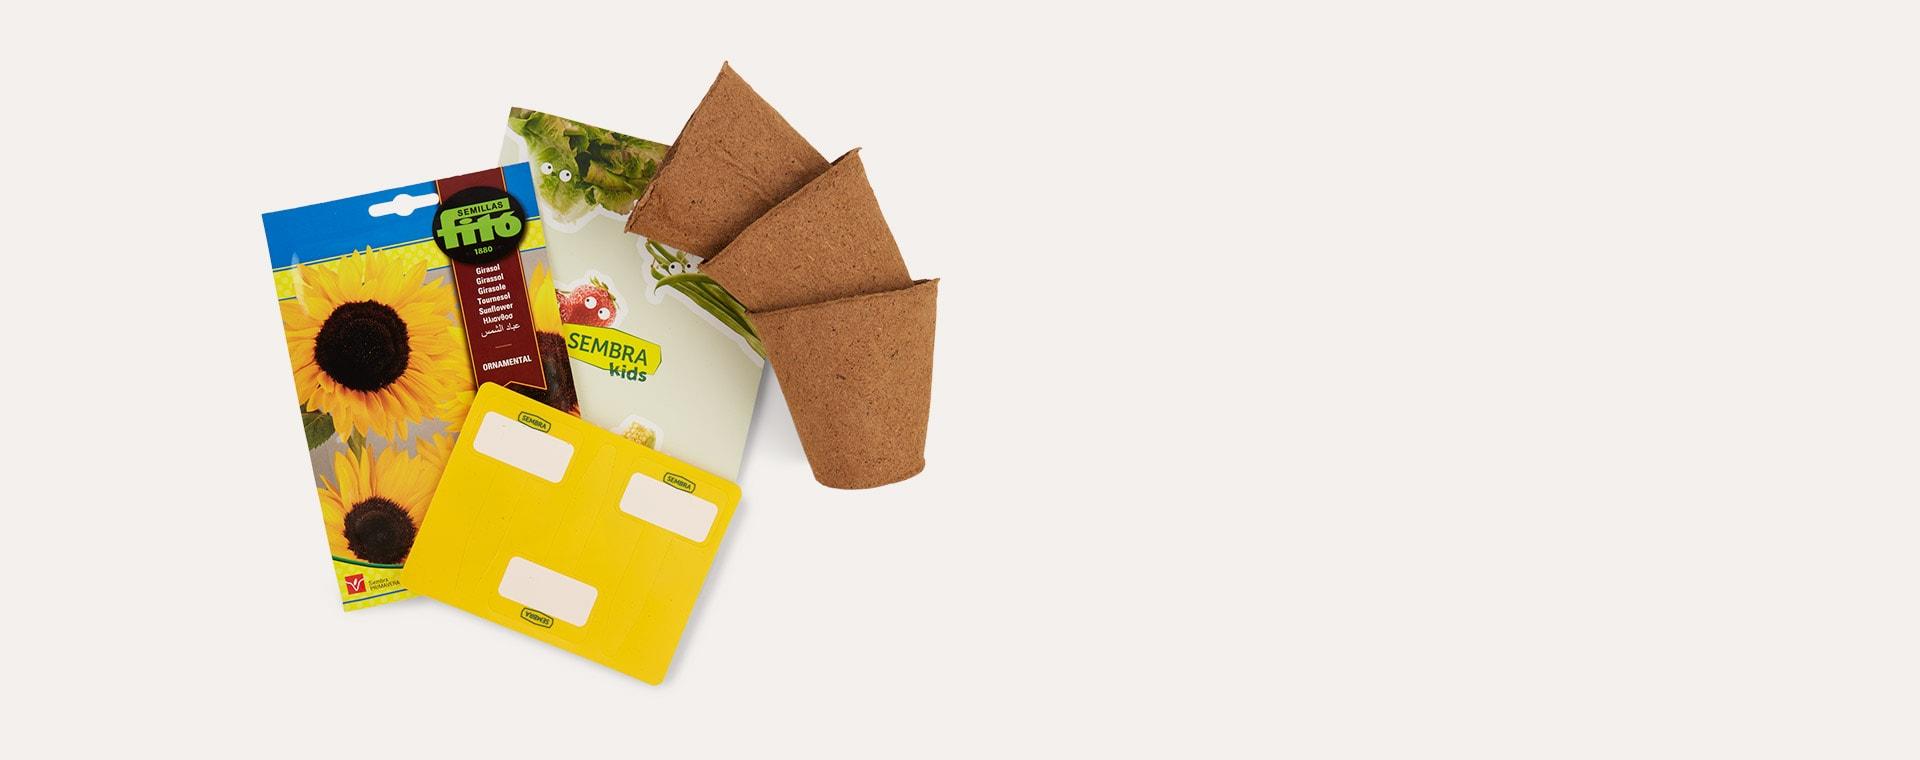 Sunflower Sembra Kids Standard Kit